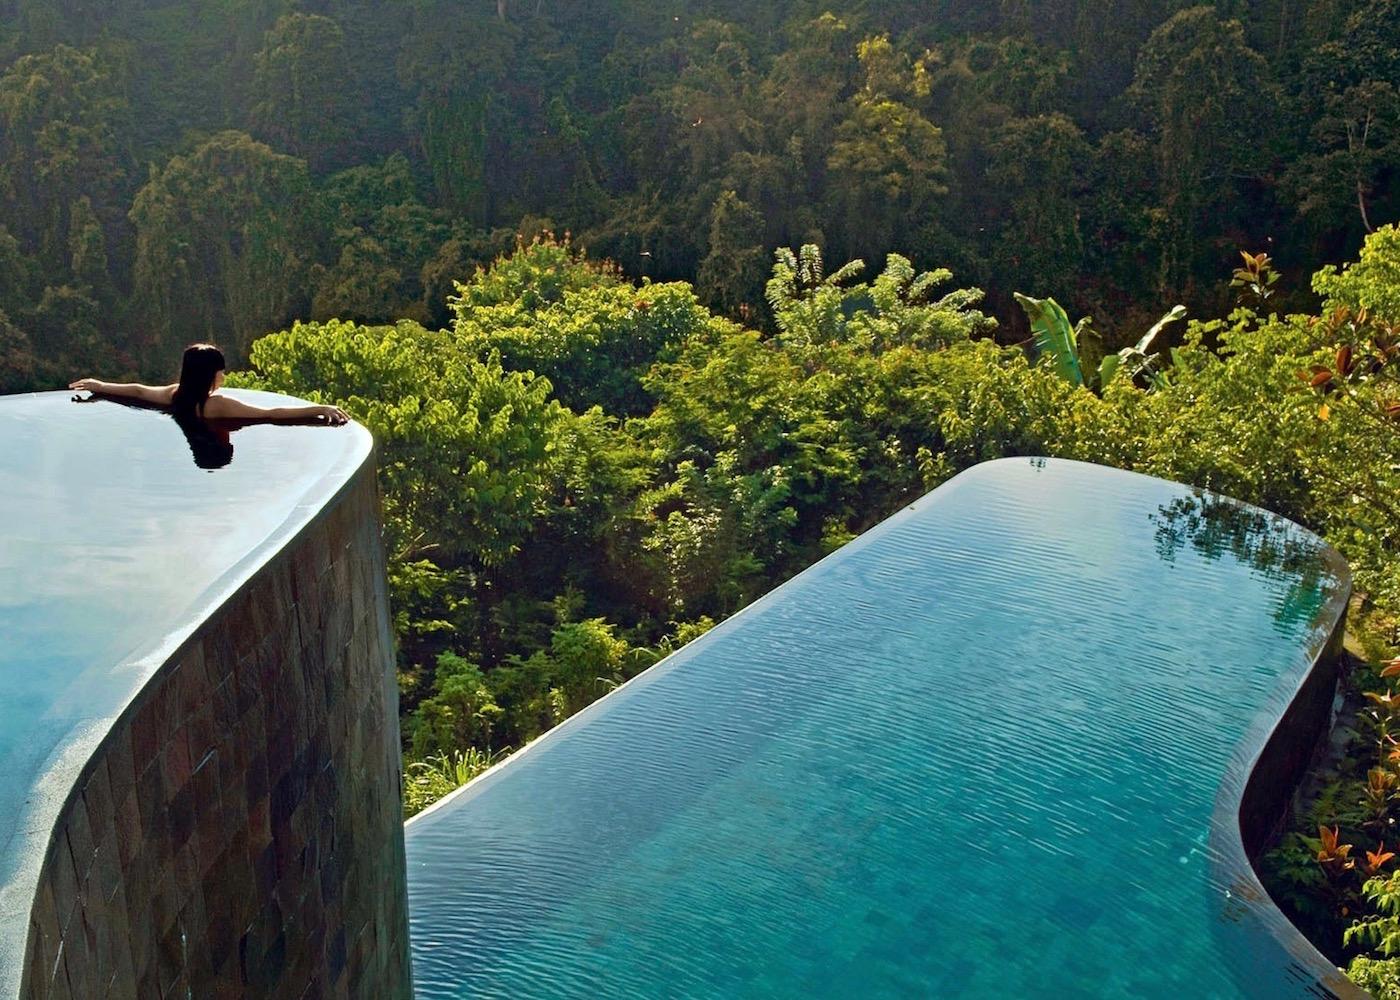 Best Ubud Hotels - Hanging Gardens of Bali - infinity pool